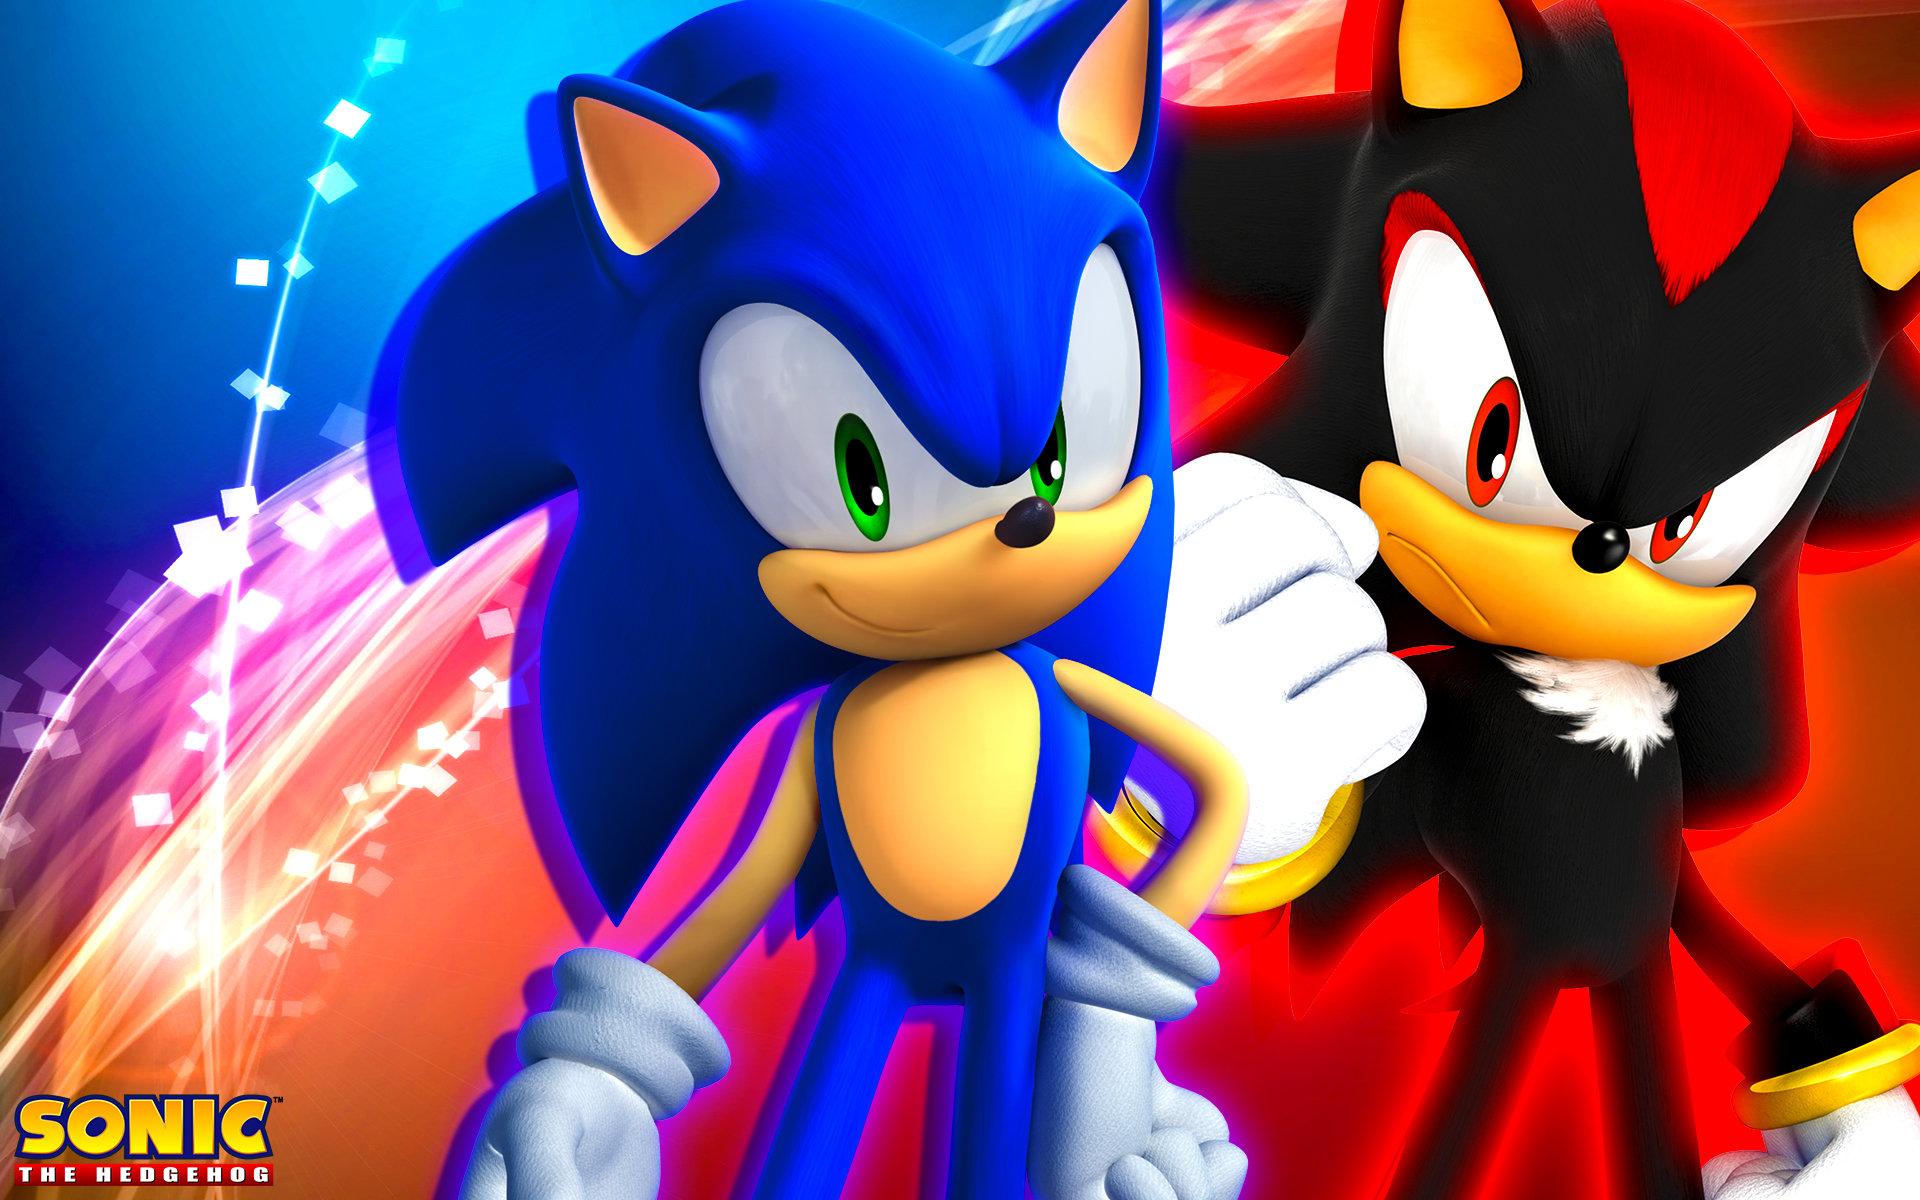 Badass dark sonic wallpapers wallpapersafari - Sonic et shadow ...